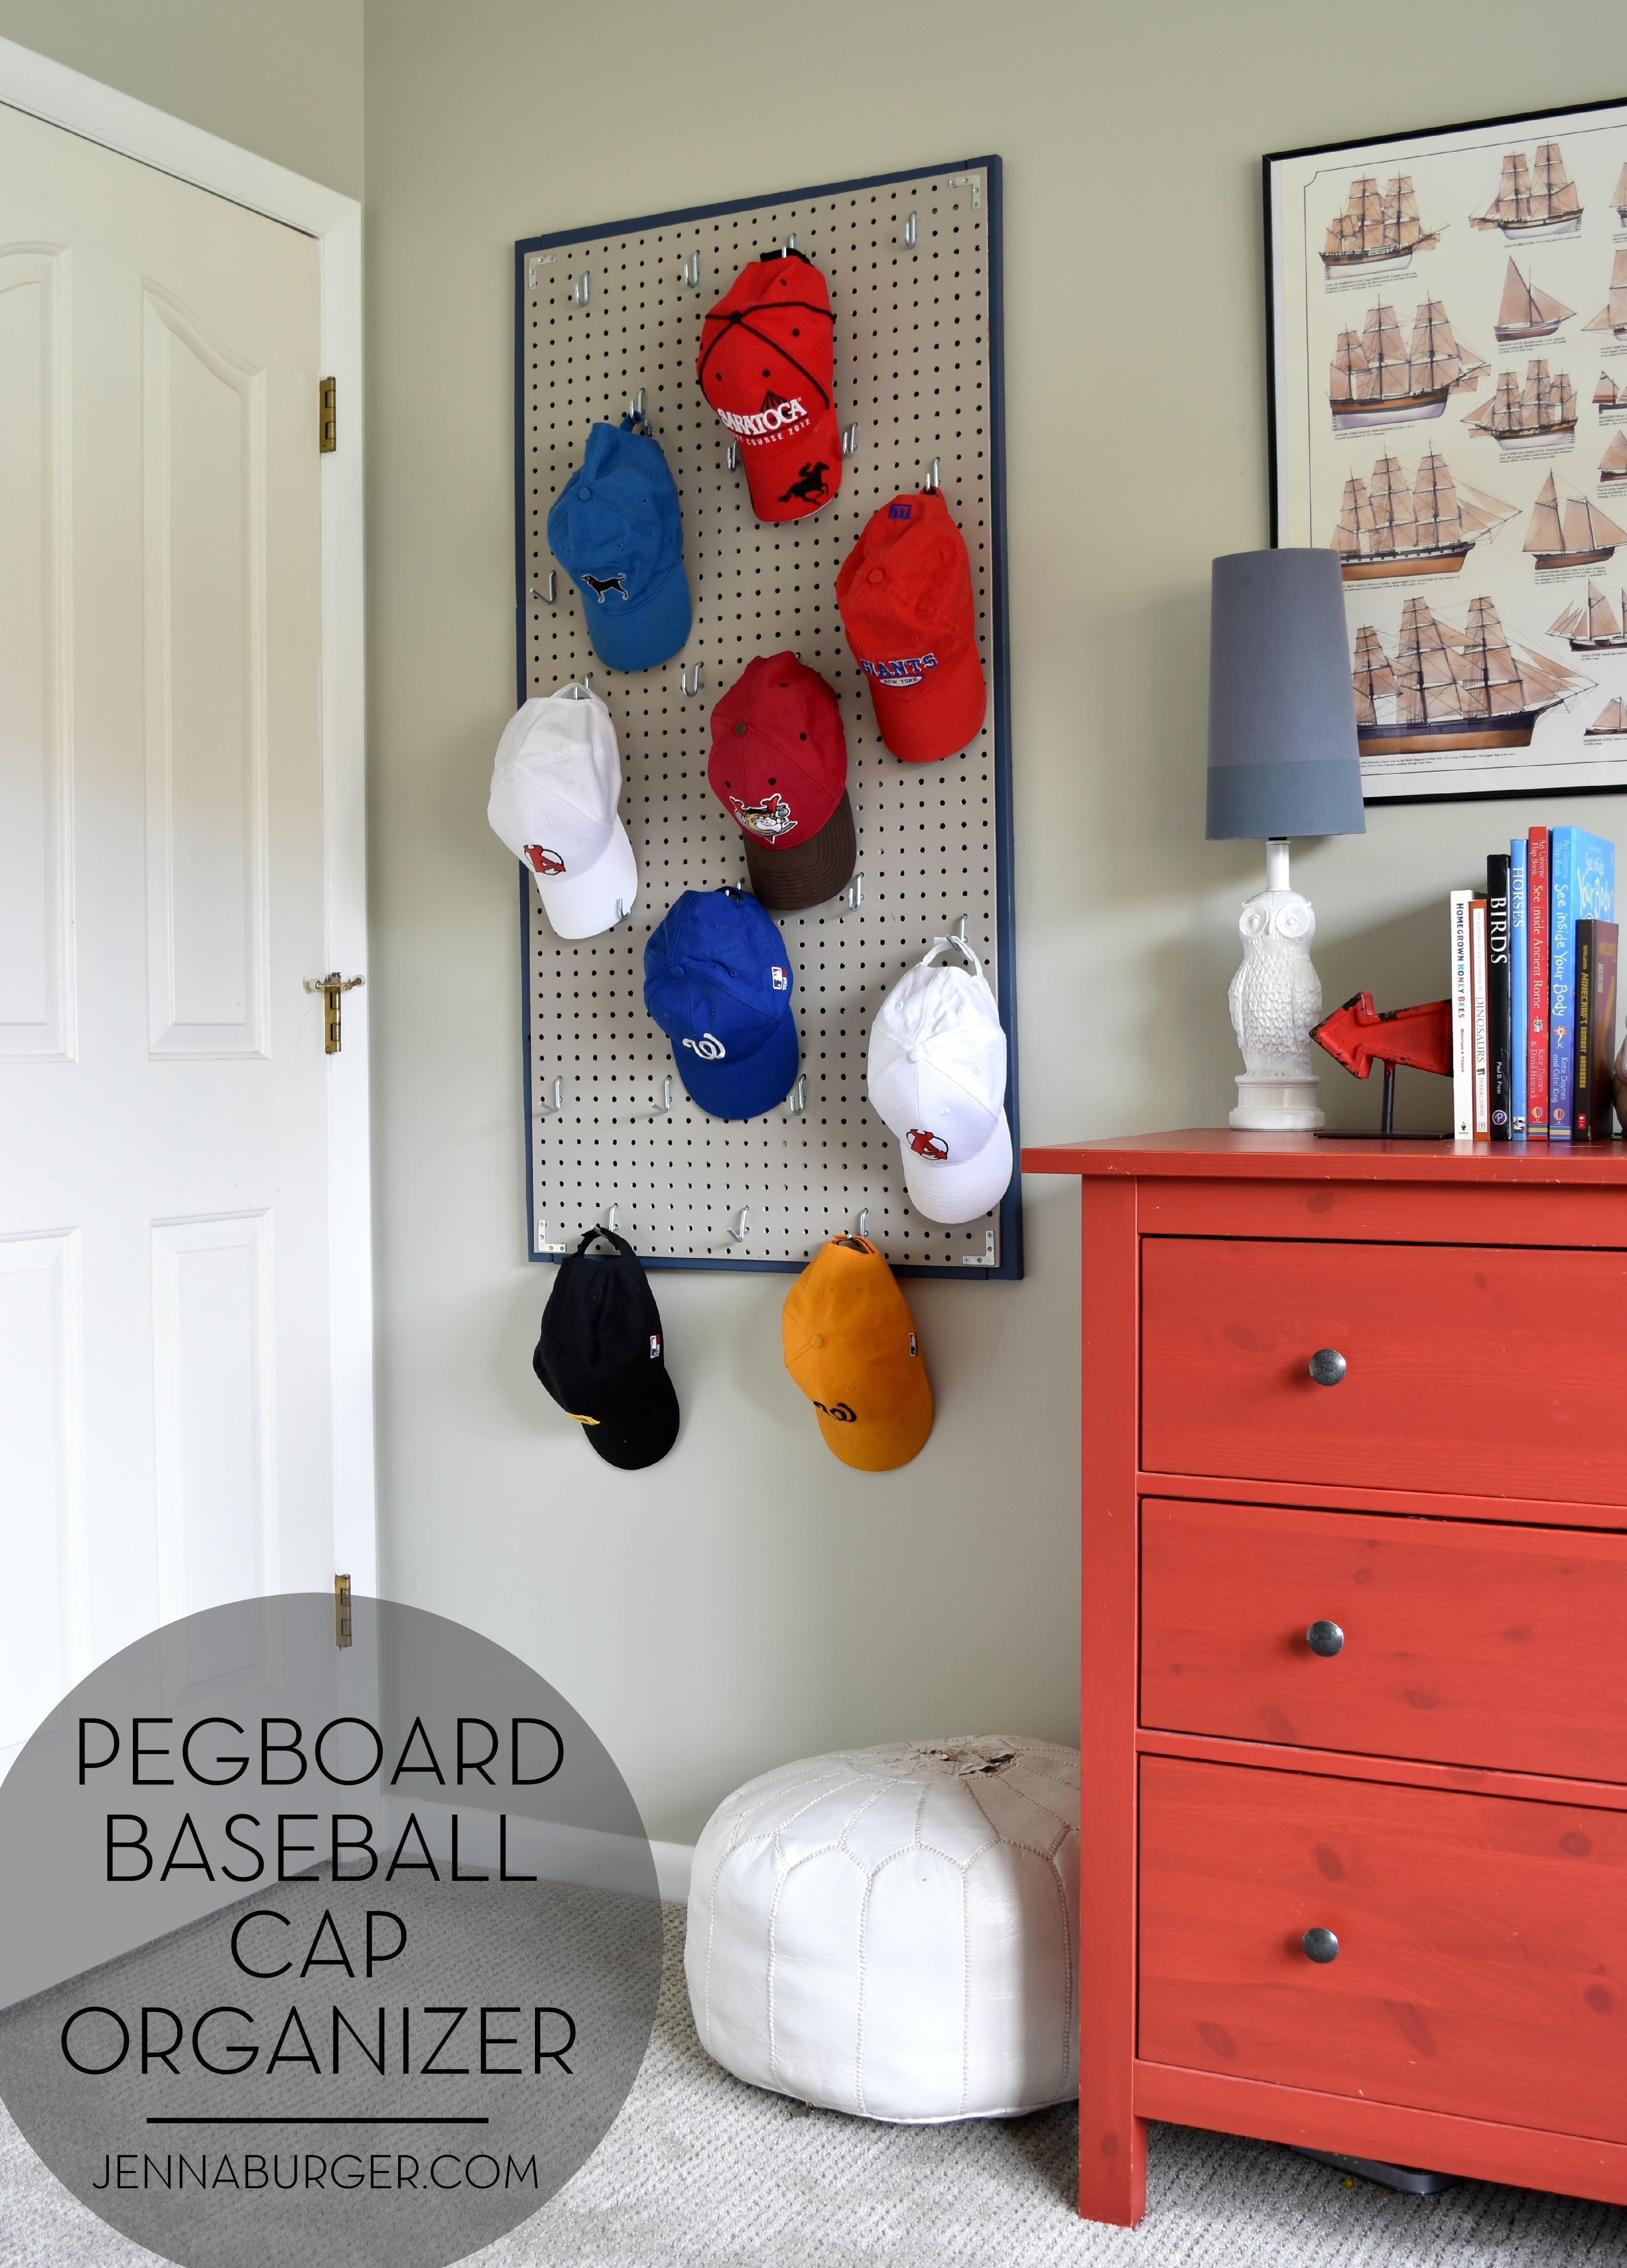 Best ideas about Hat Organizer DIY . Save or Pin Pegboard Baseball Cap Organizer Jenna Burger Now.